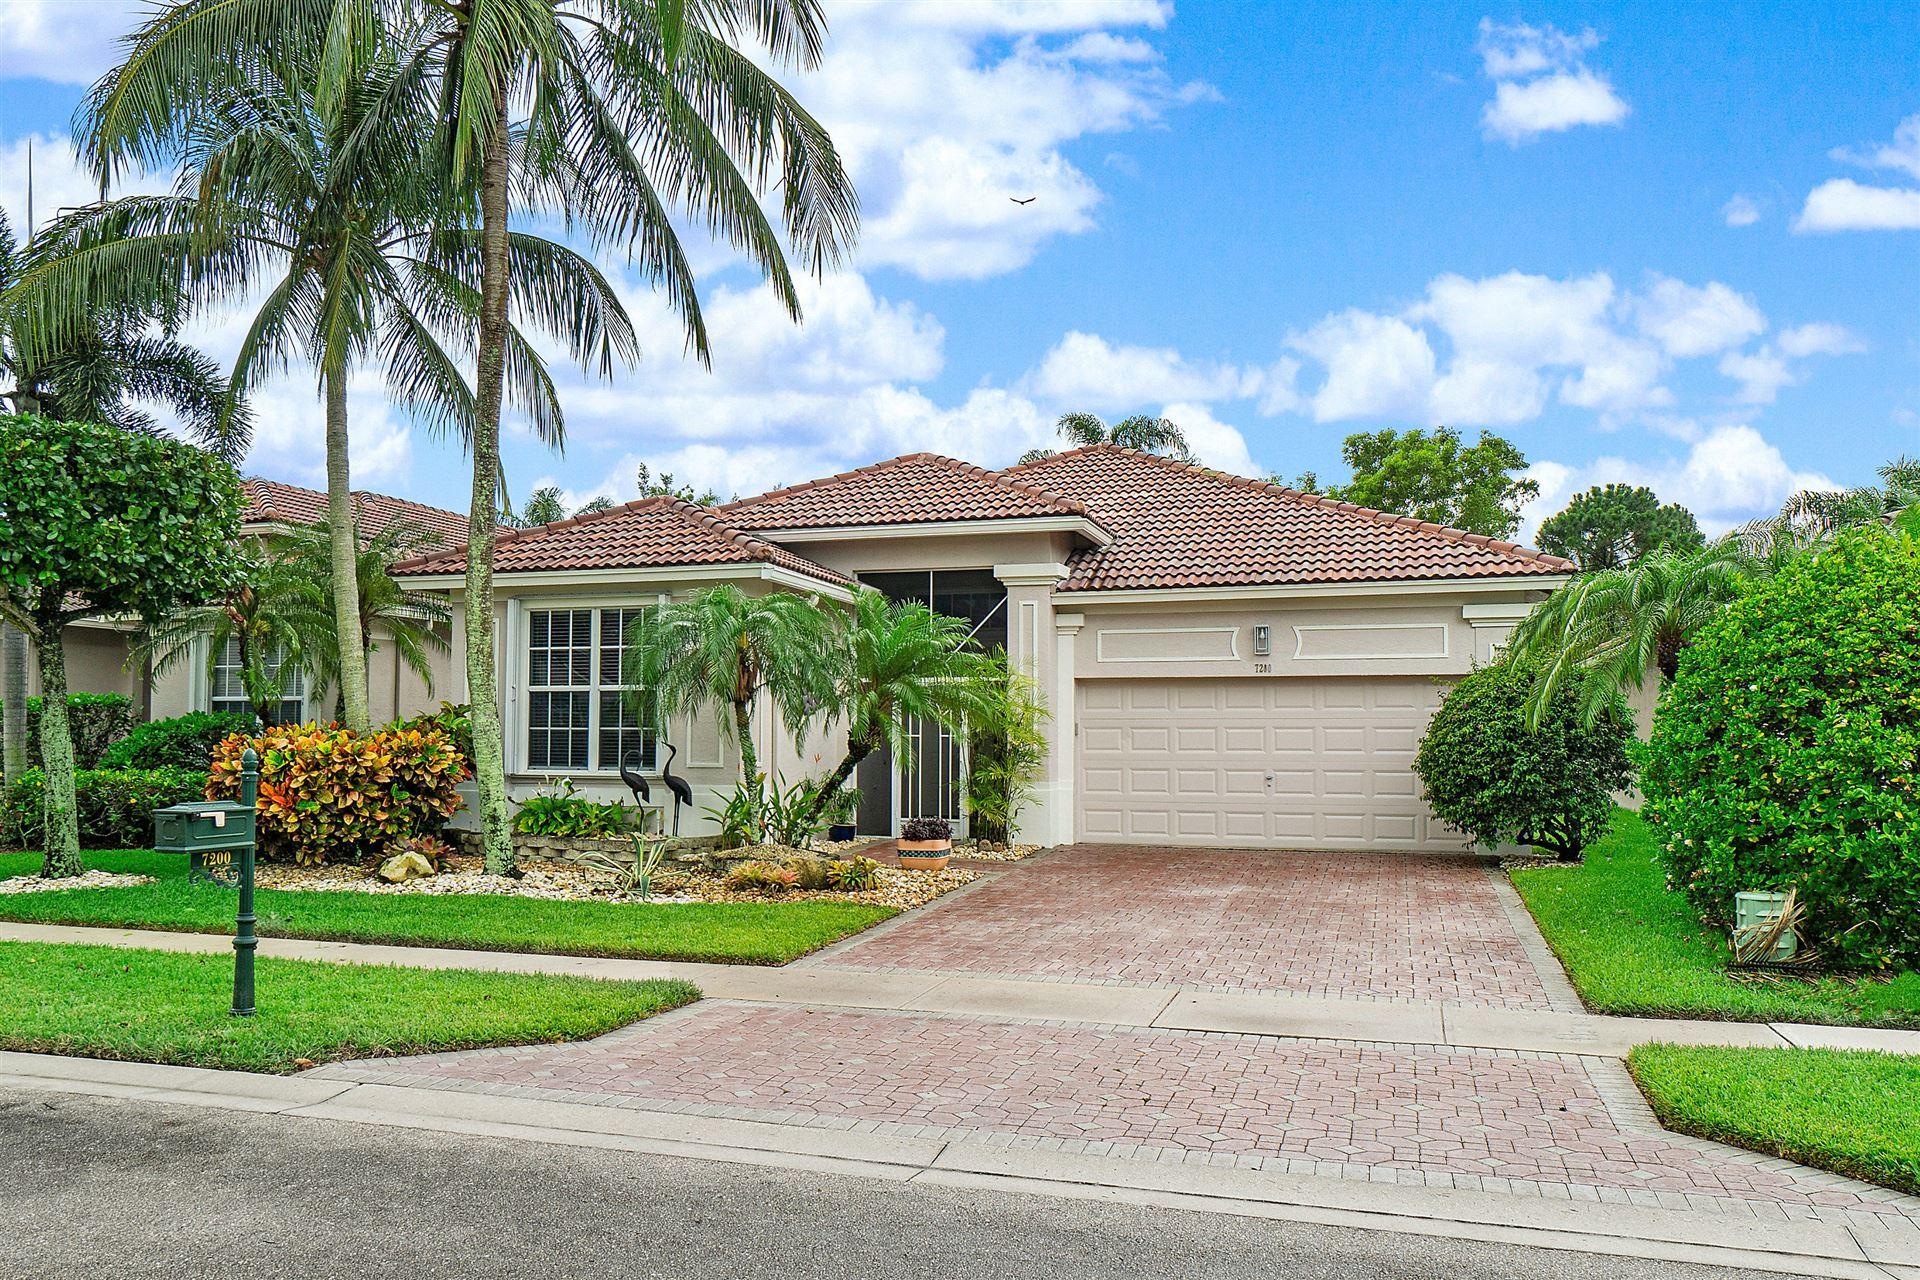 Photo for 7200 Southport Drive, Boynton Beach, FL 33472 (MLS # RX-10624896)